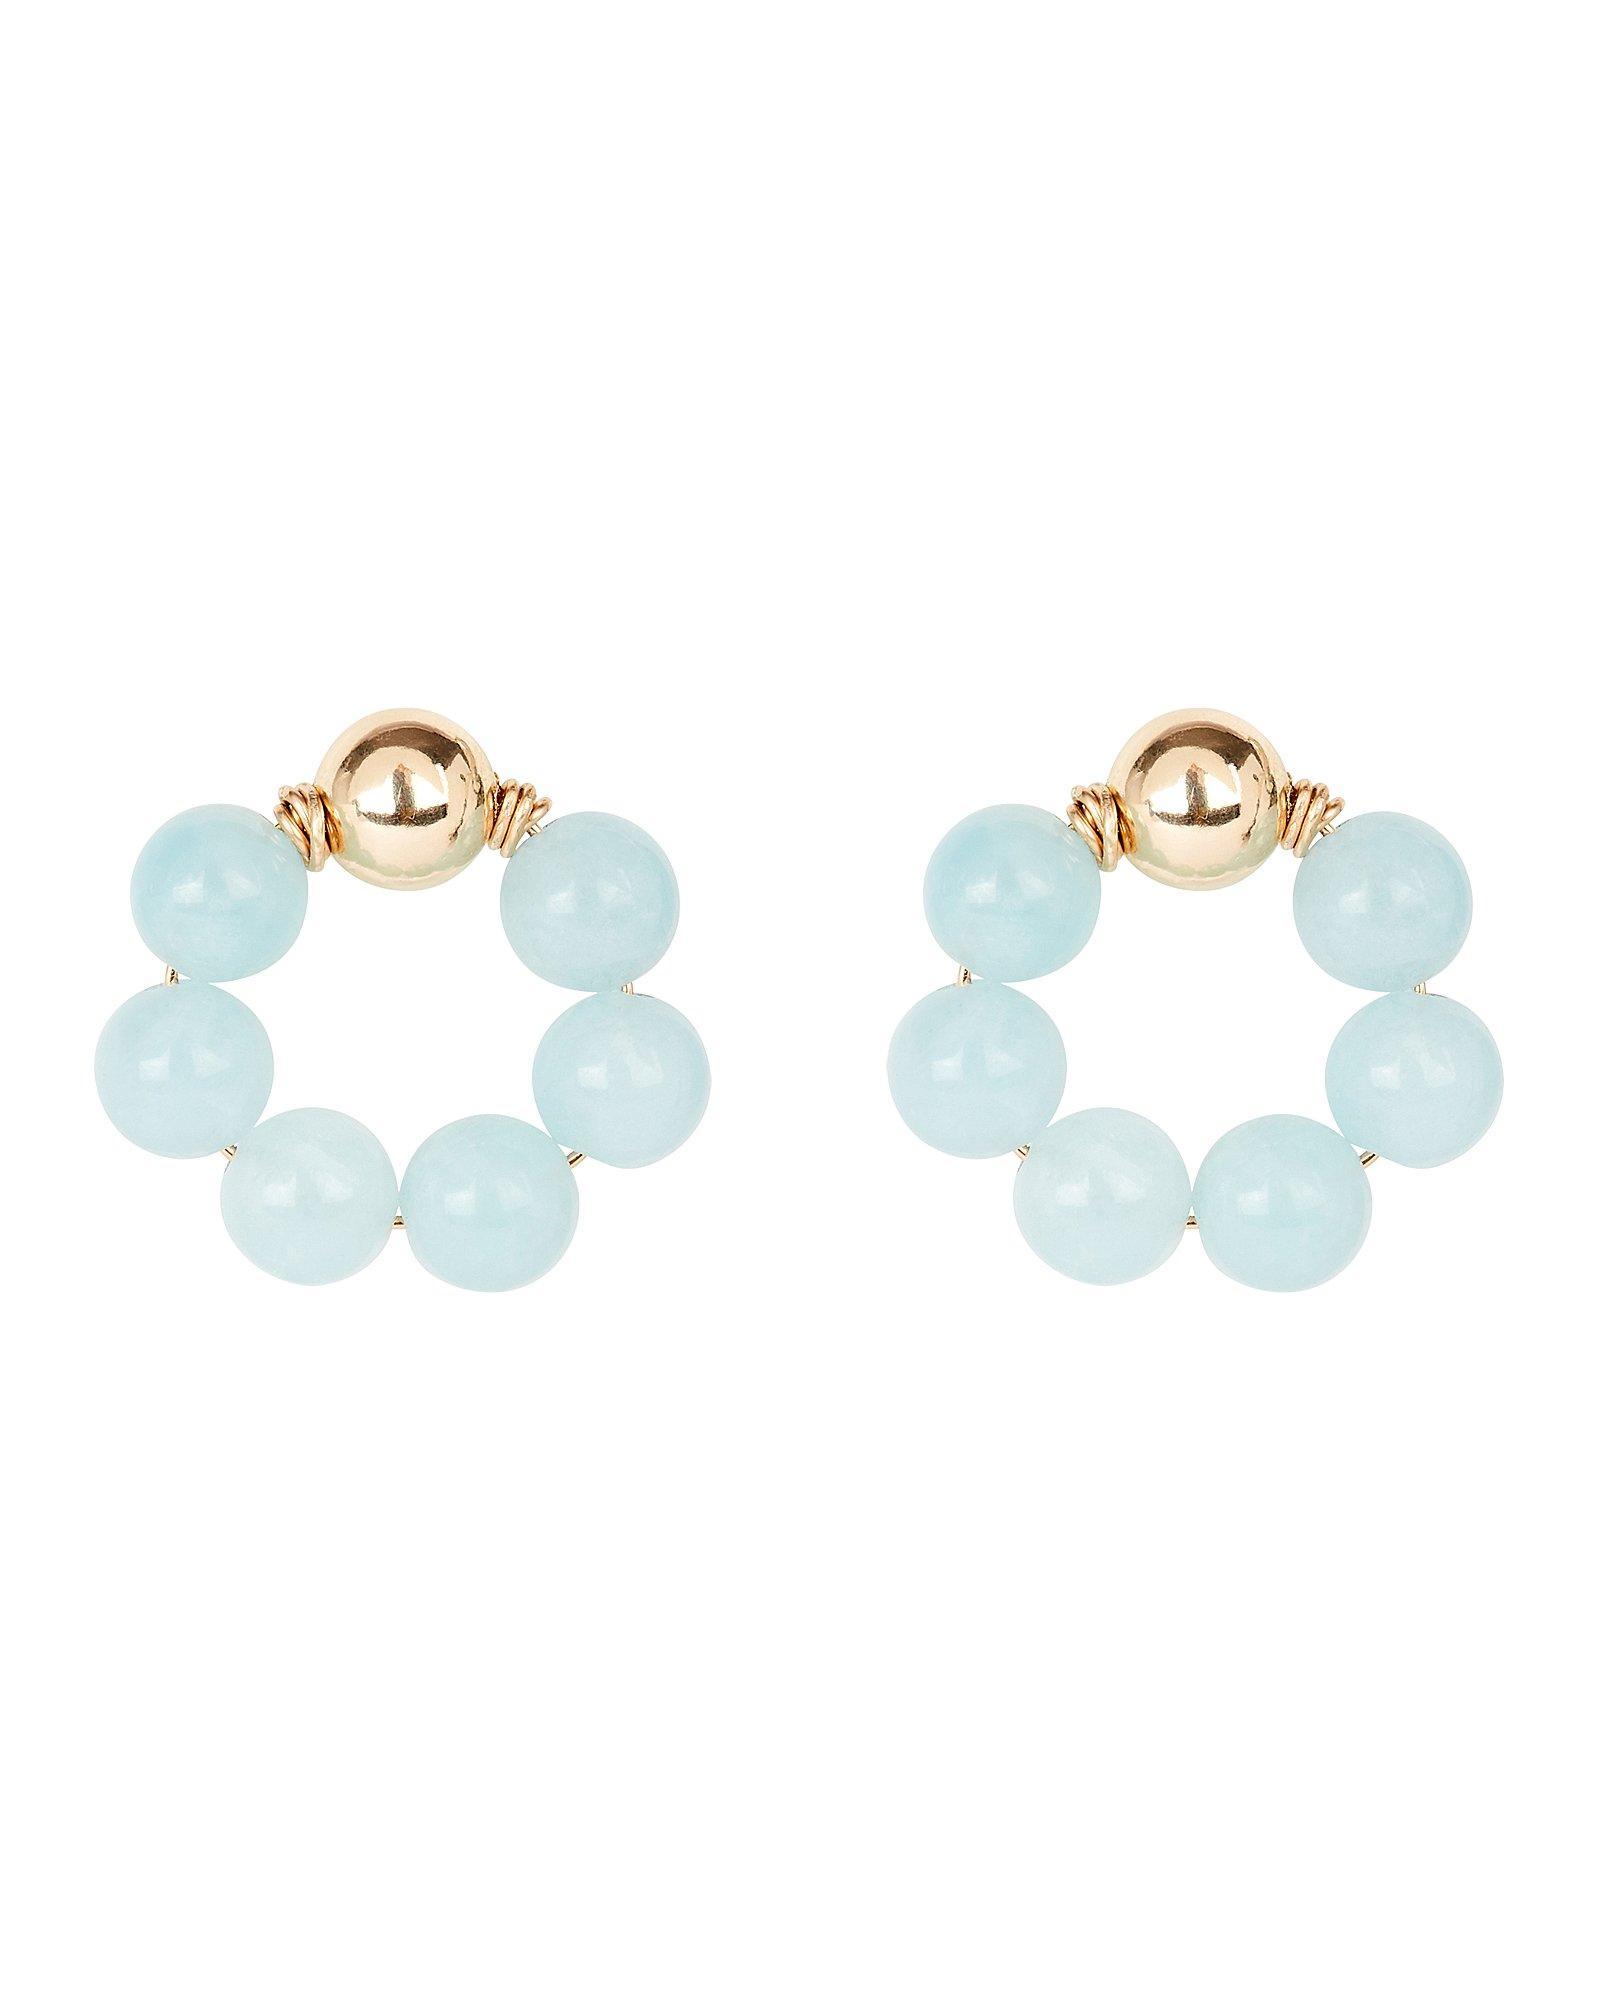 Statement avant-garde earrings Imitation of quartz and gemstones Big but lightweight epoxy resin earrings Unique handmade earrings